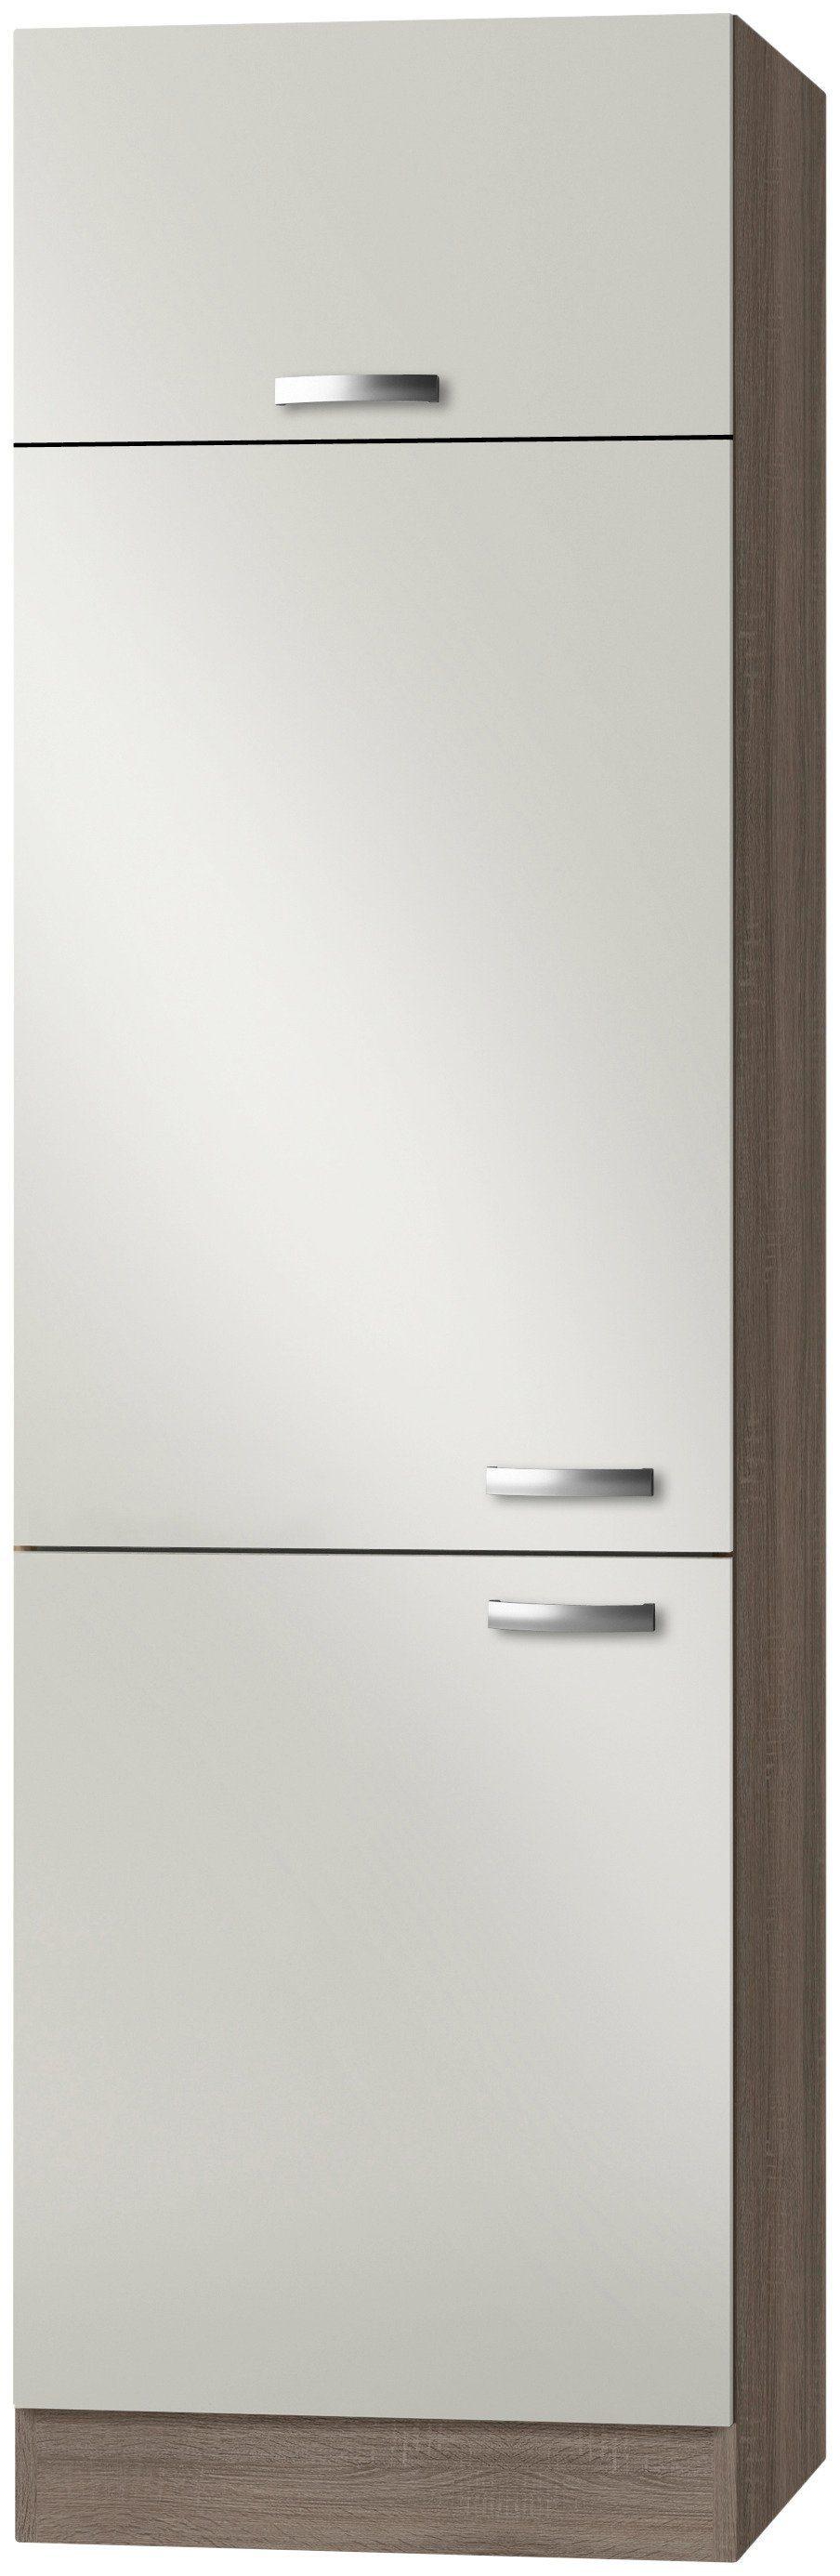 OPTIFIT Kühlumbauschrank »Rom, Höhe 206,8 cm«